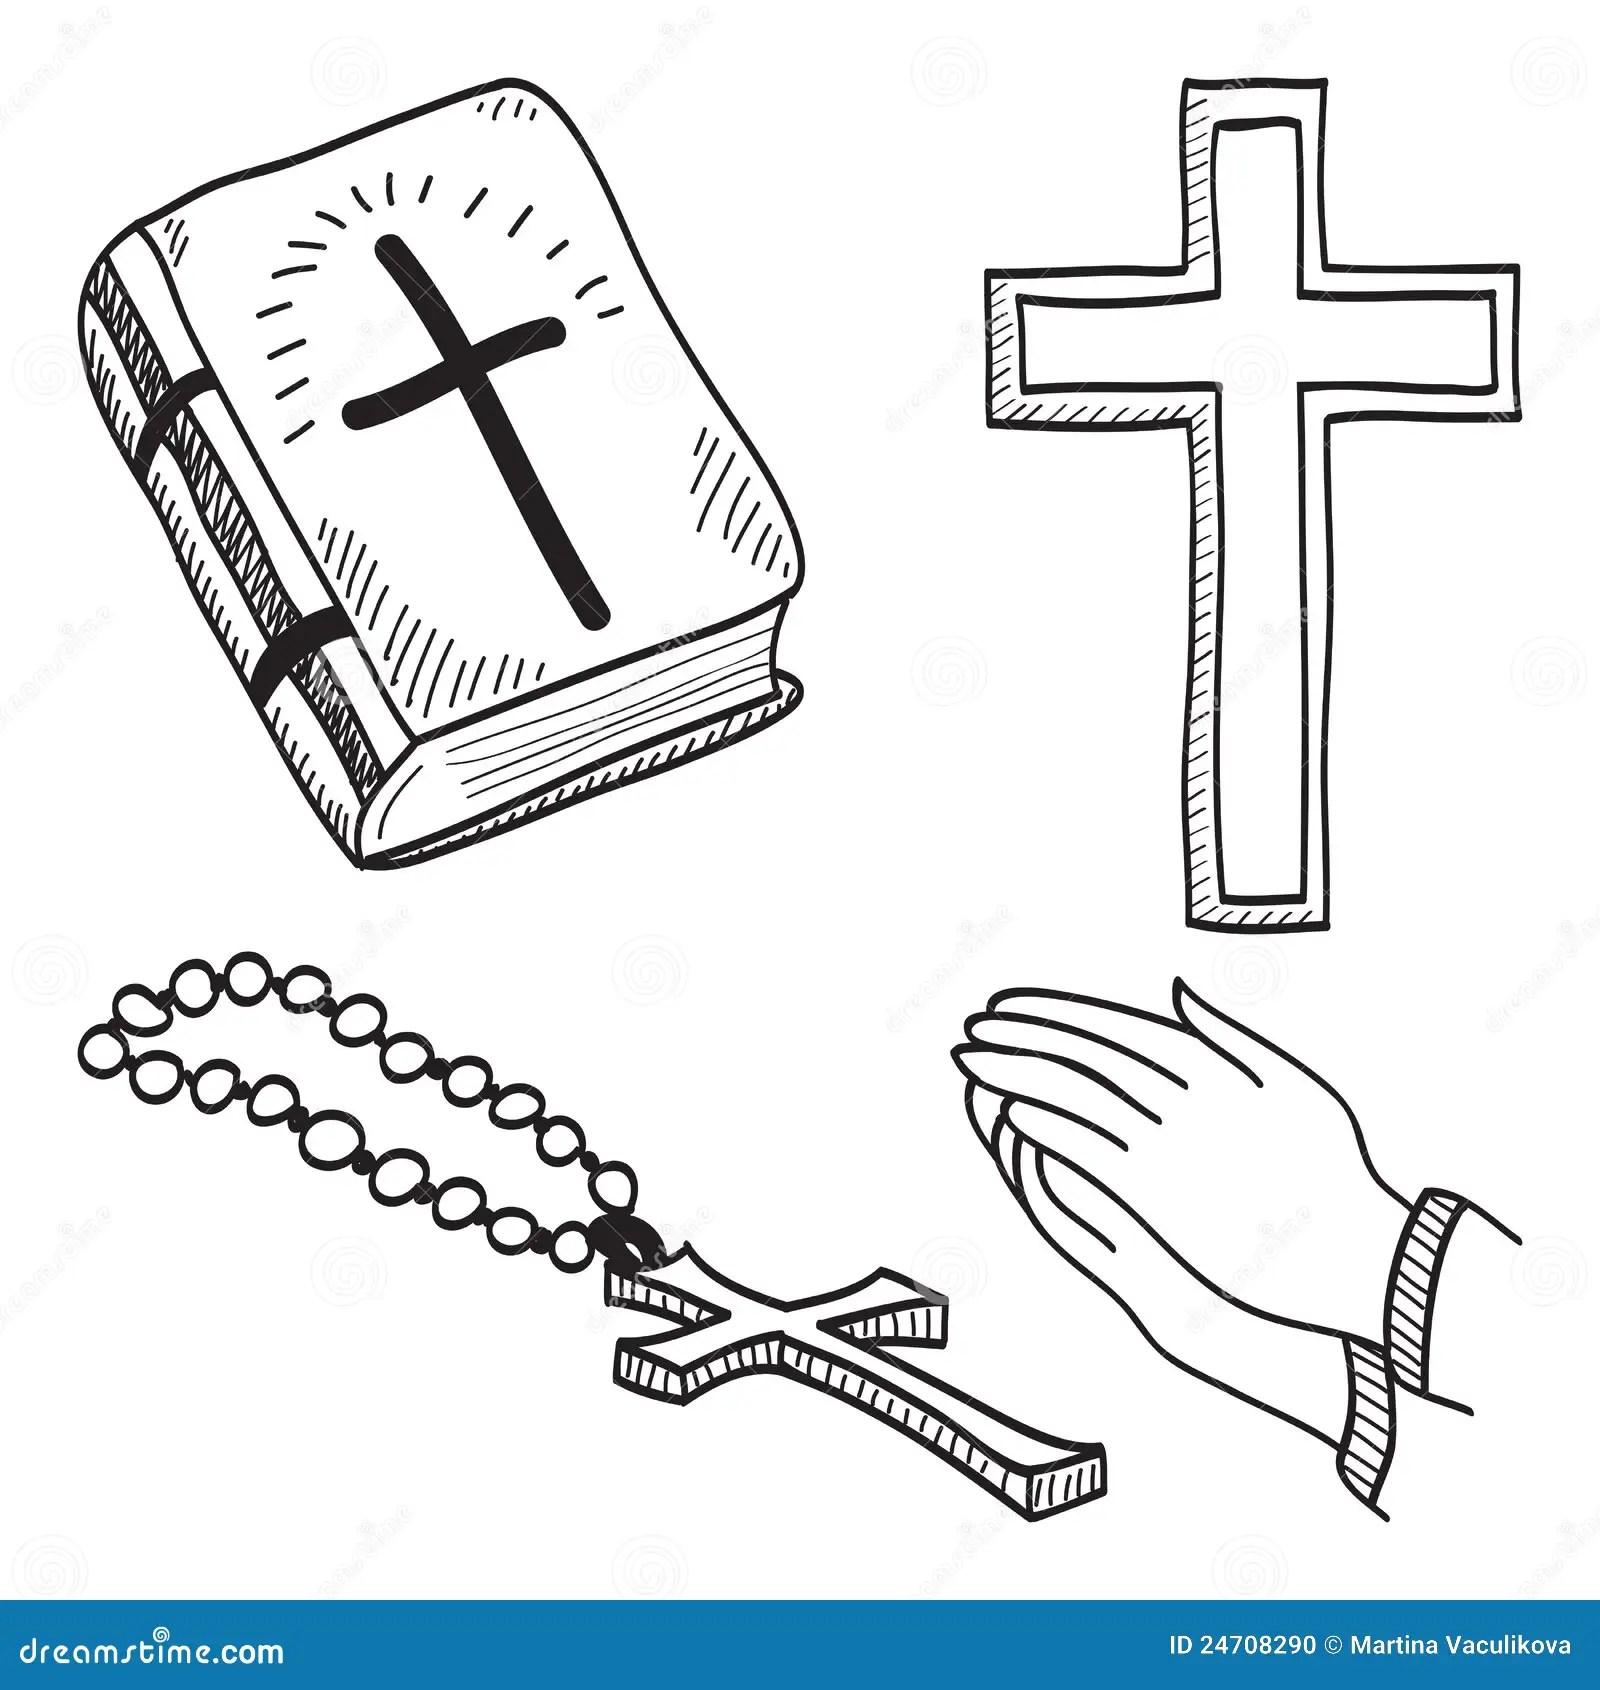 Christian Hand Drawn Symbols Illustration Stock Vector